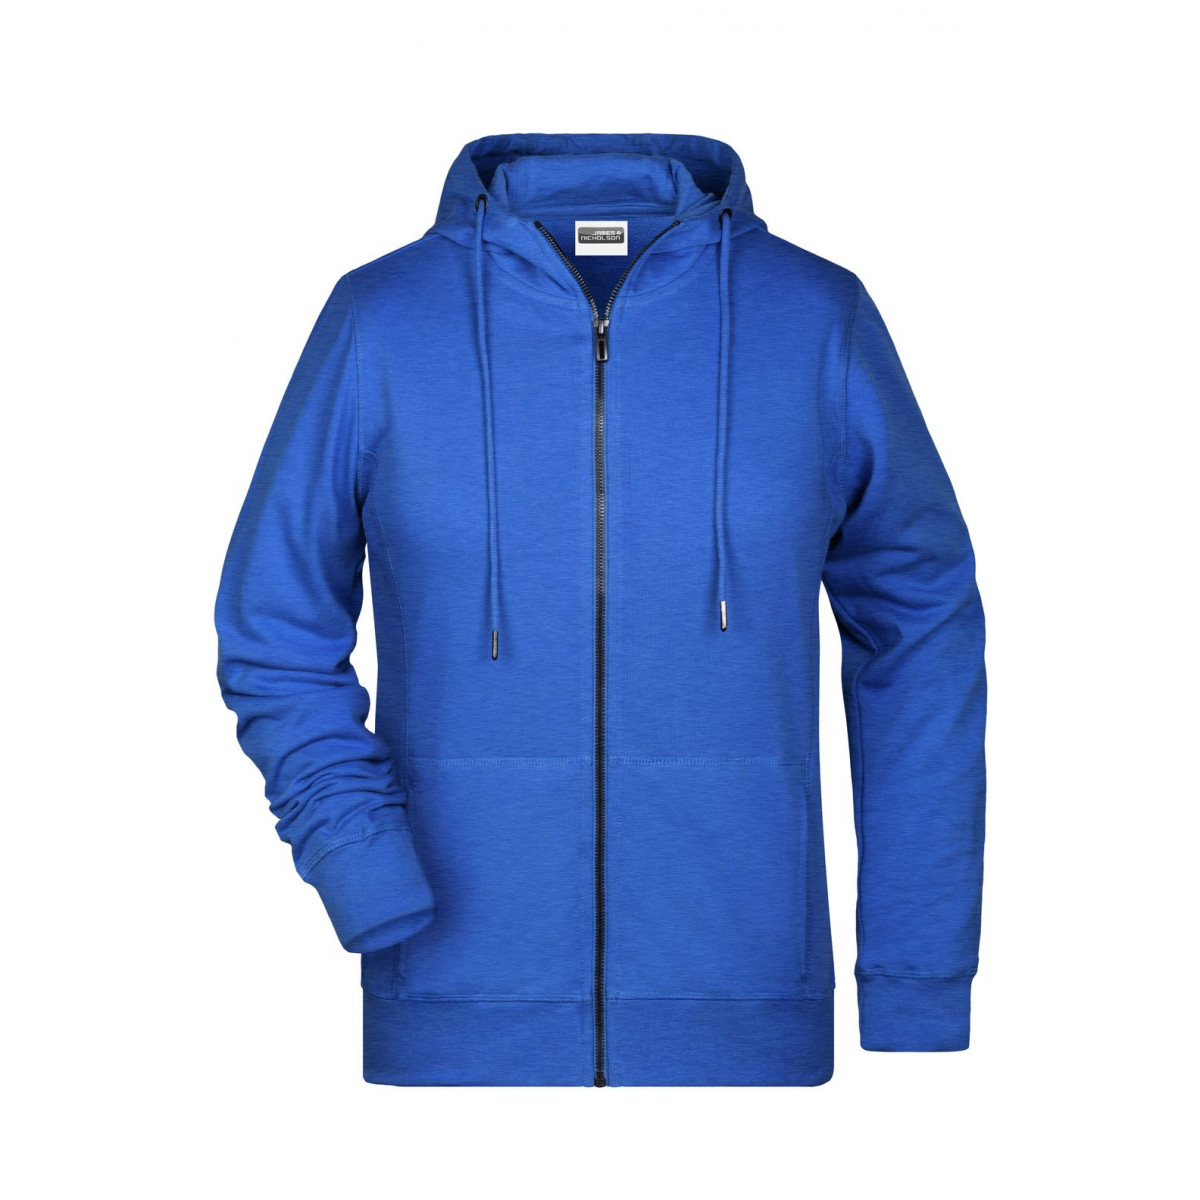 Толстовка женская 8025 Ladies Zip Hoody - Ярко-синий меоанж